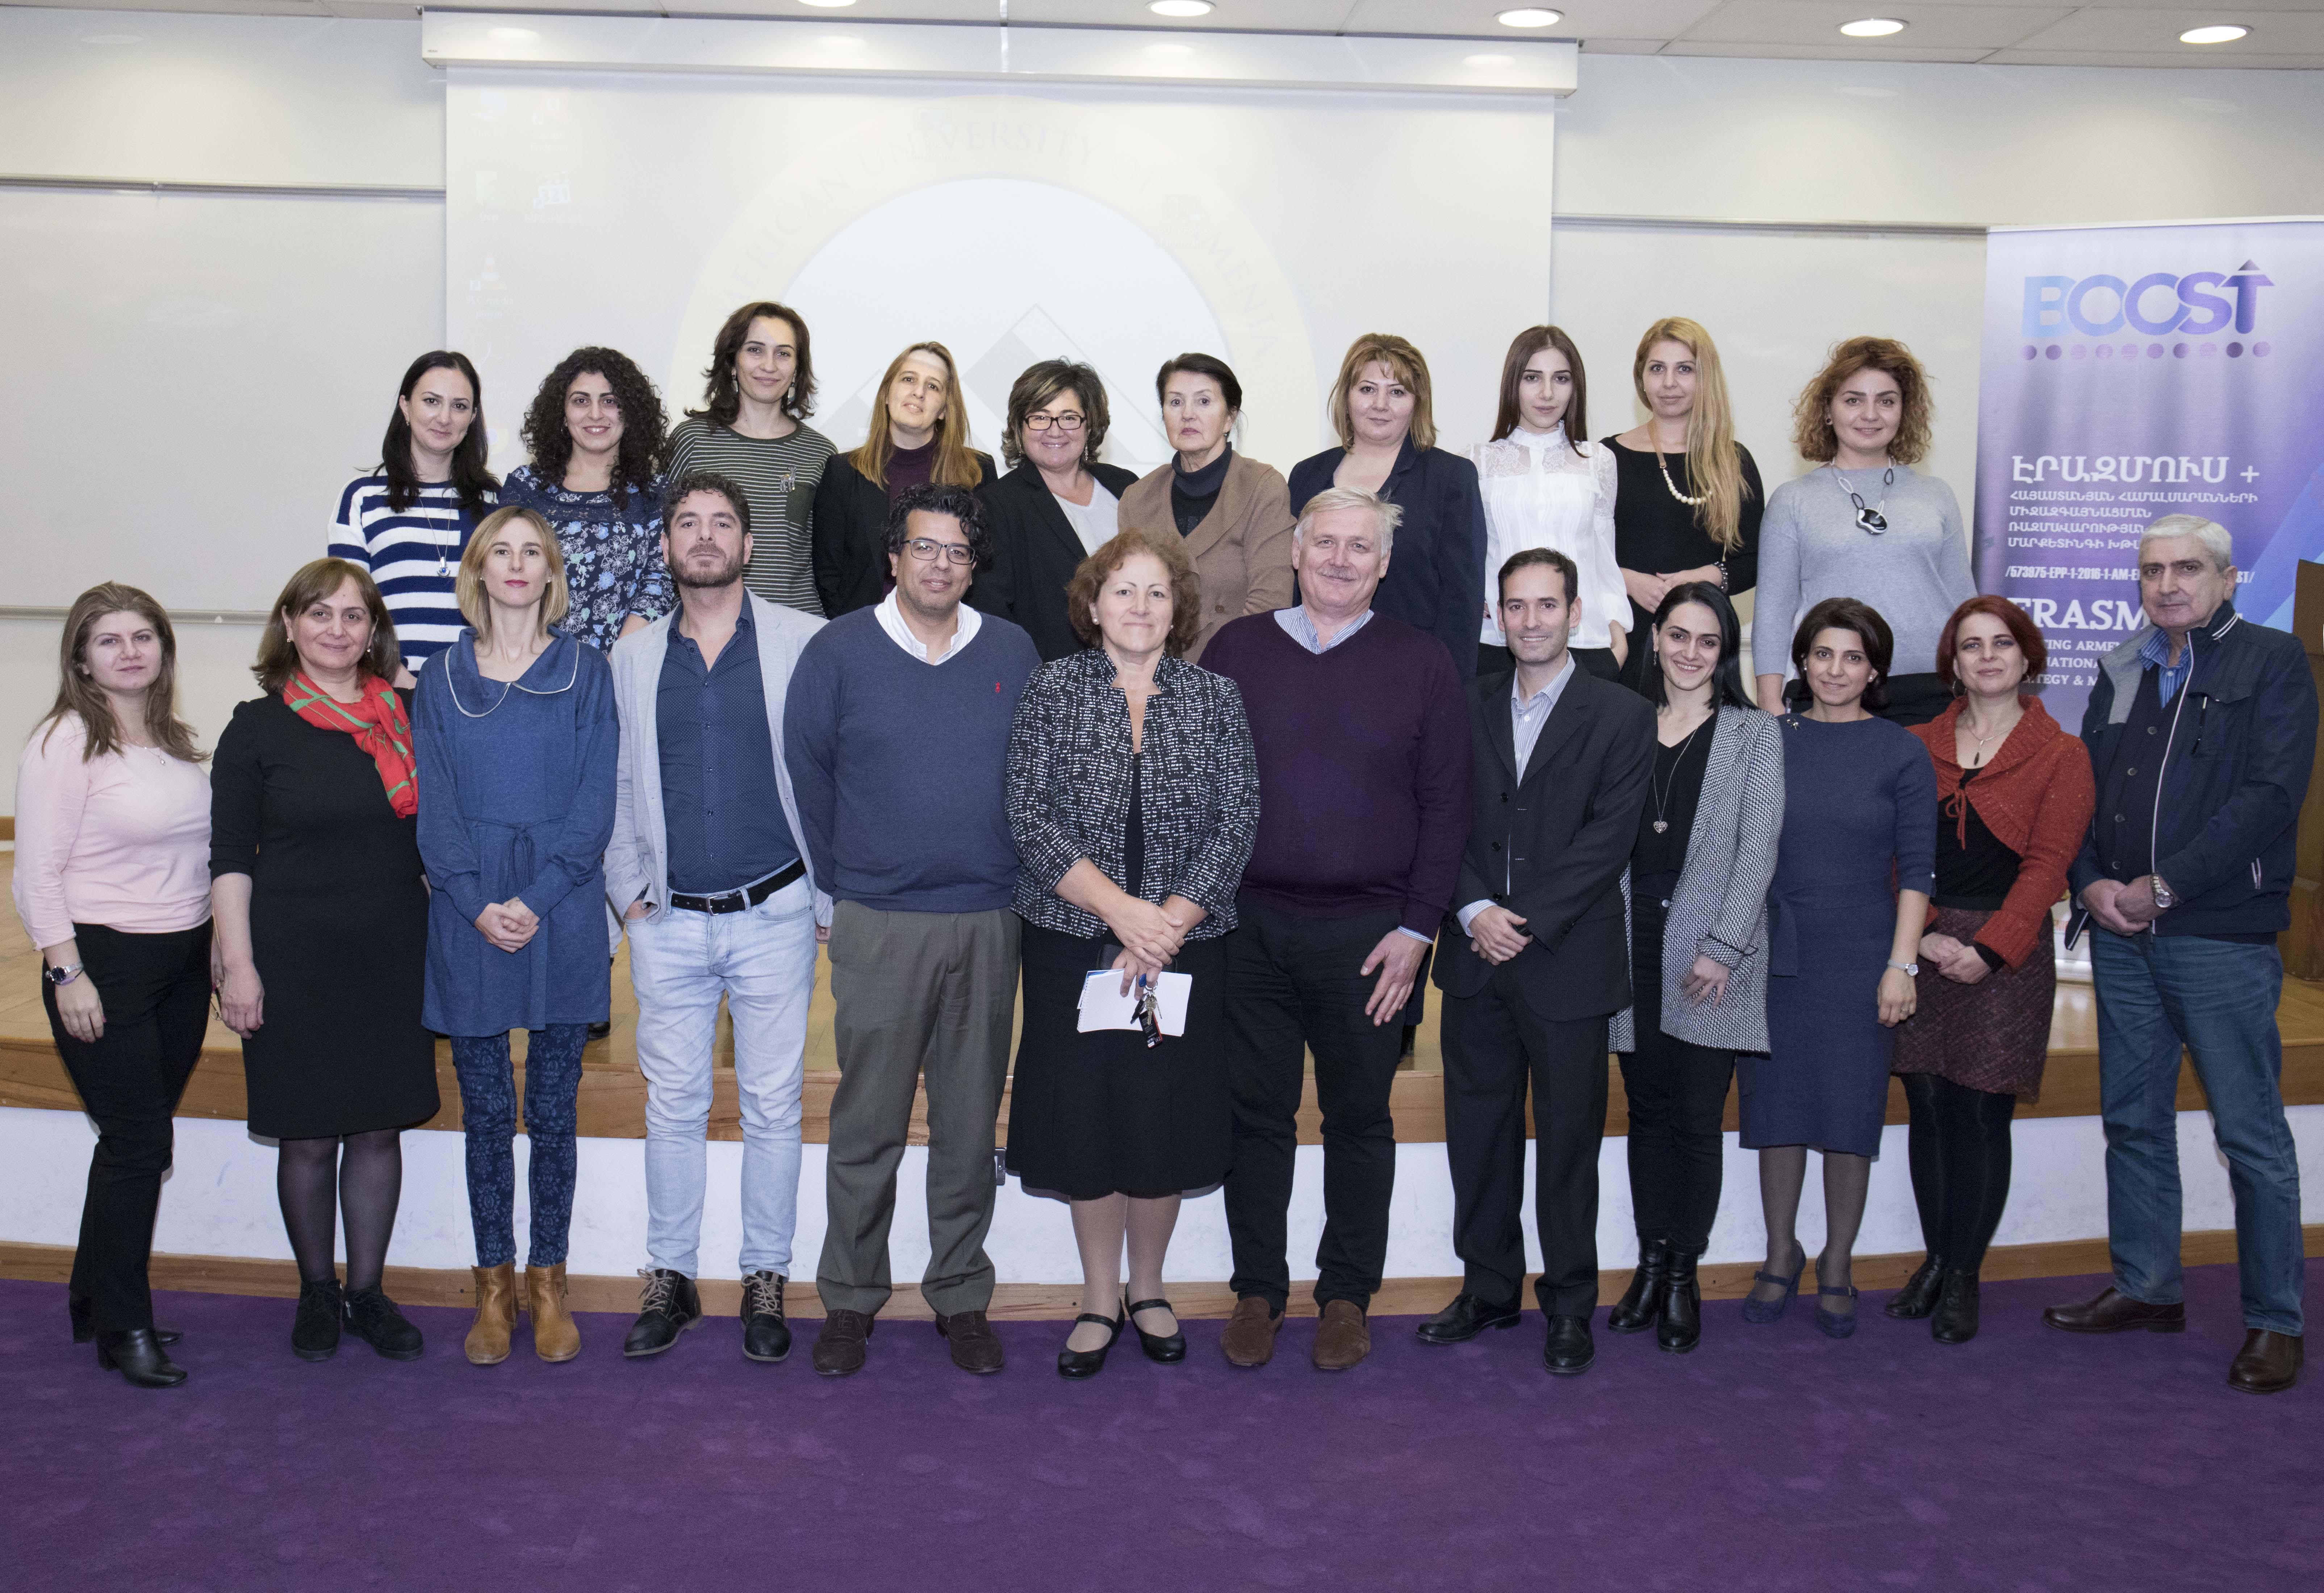 Erasmus+ BOOST Conference Strategizes Internationalization of